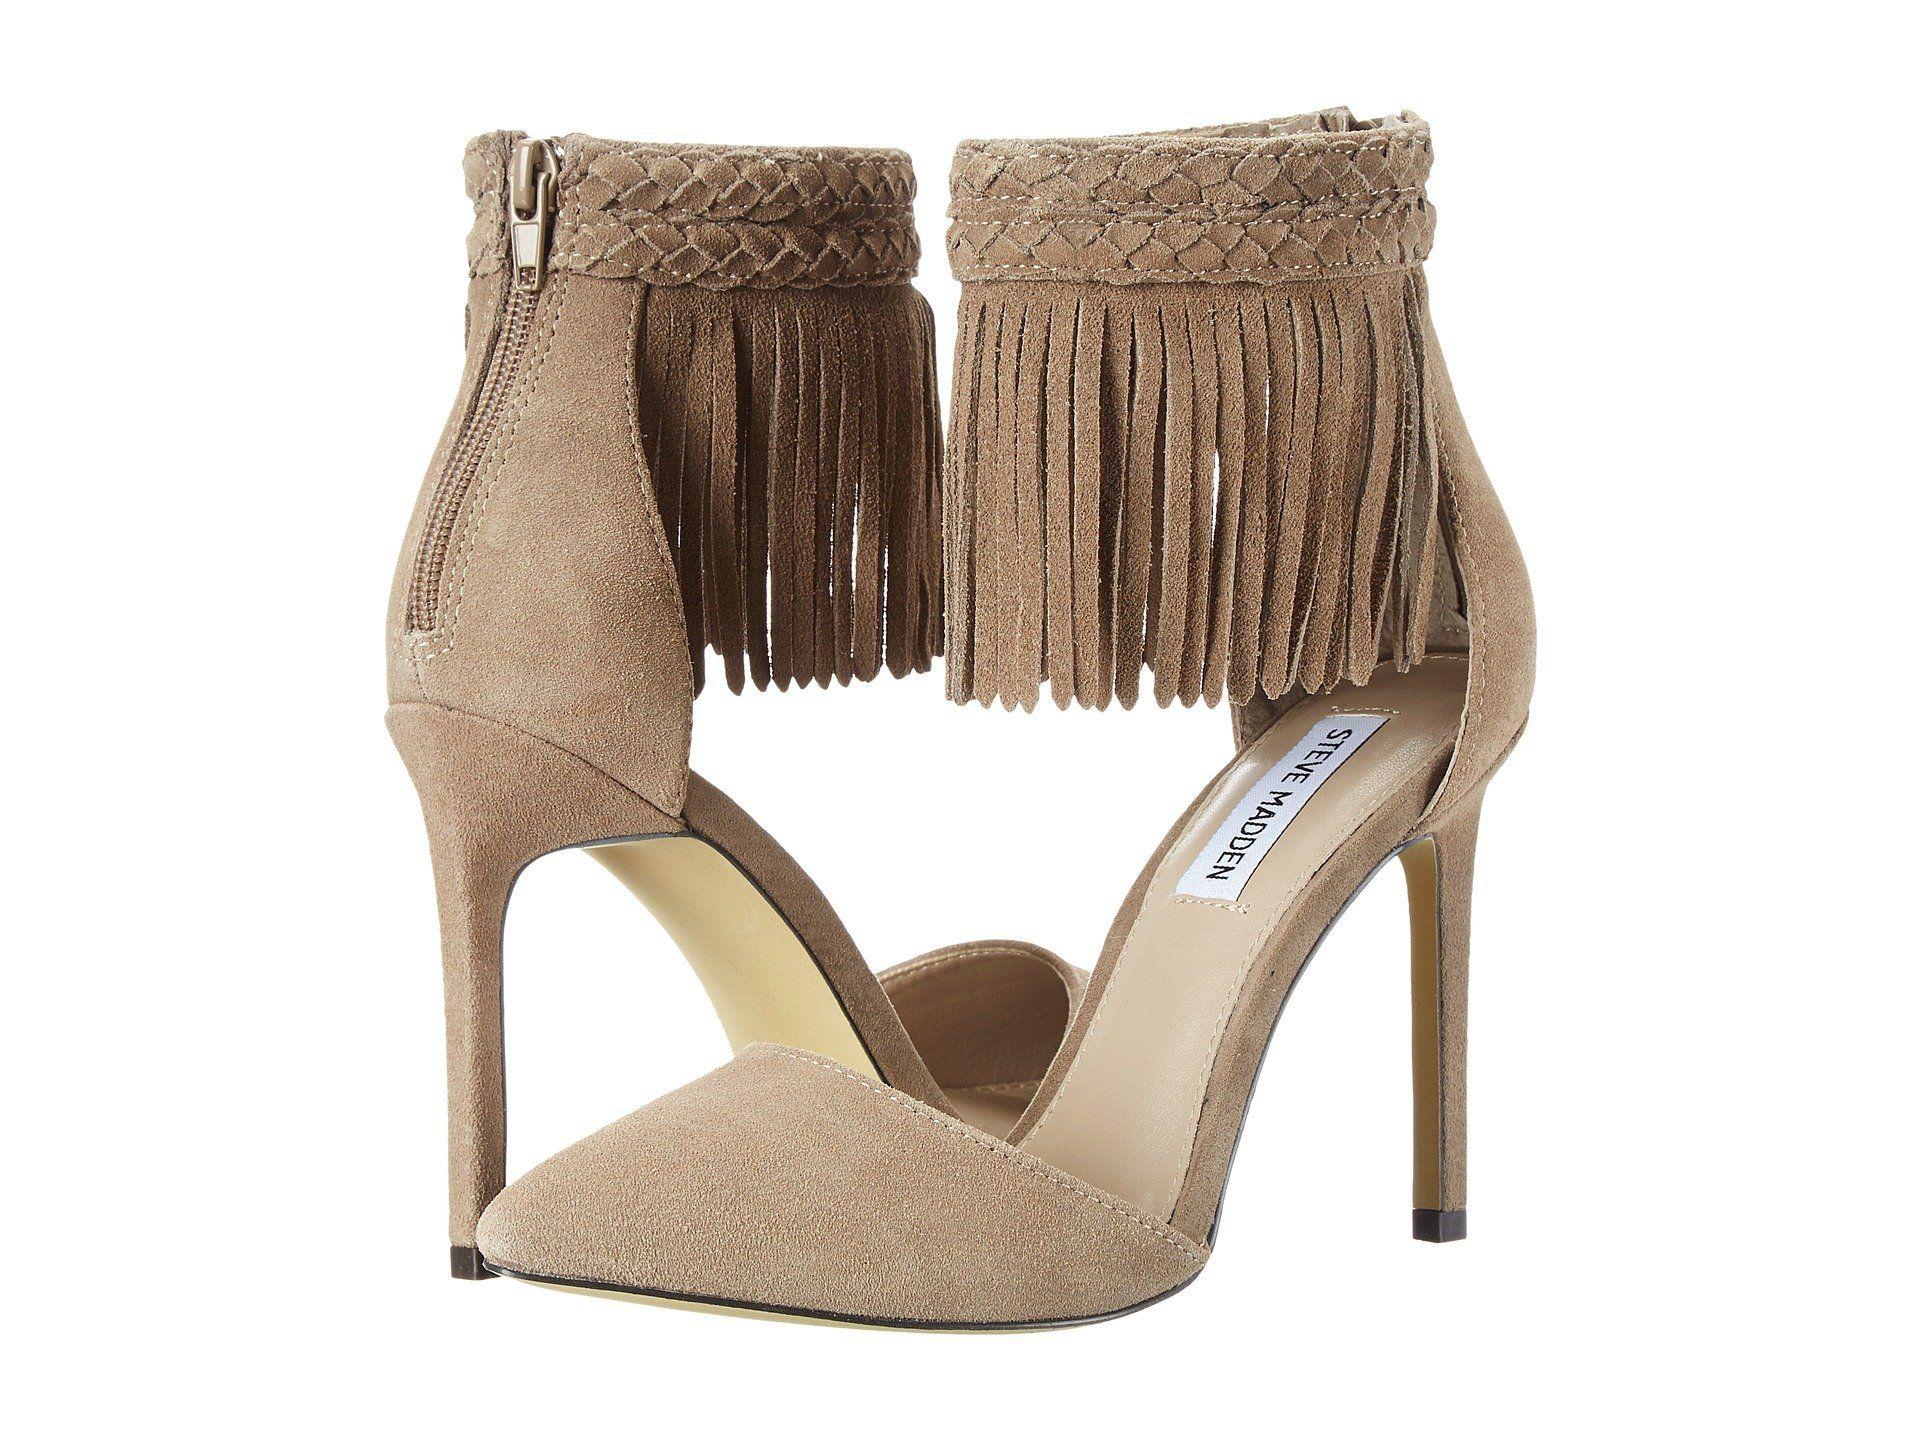 13c2398d749f8 Melia Steve Madden | 6pm.com | ✒éclat | Fashion, Heels, Steve madden